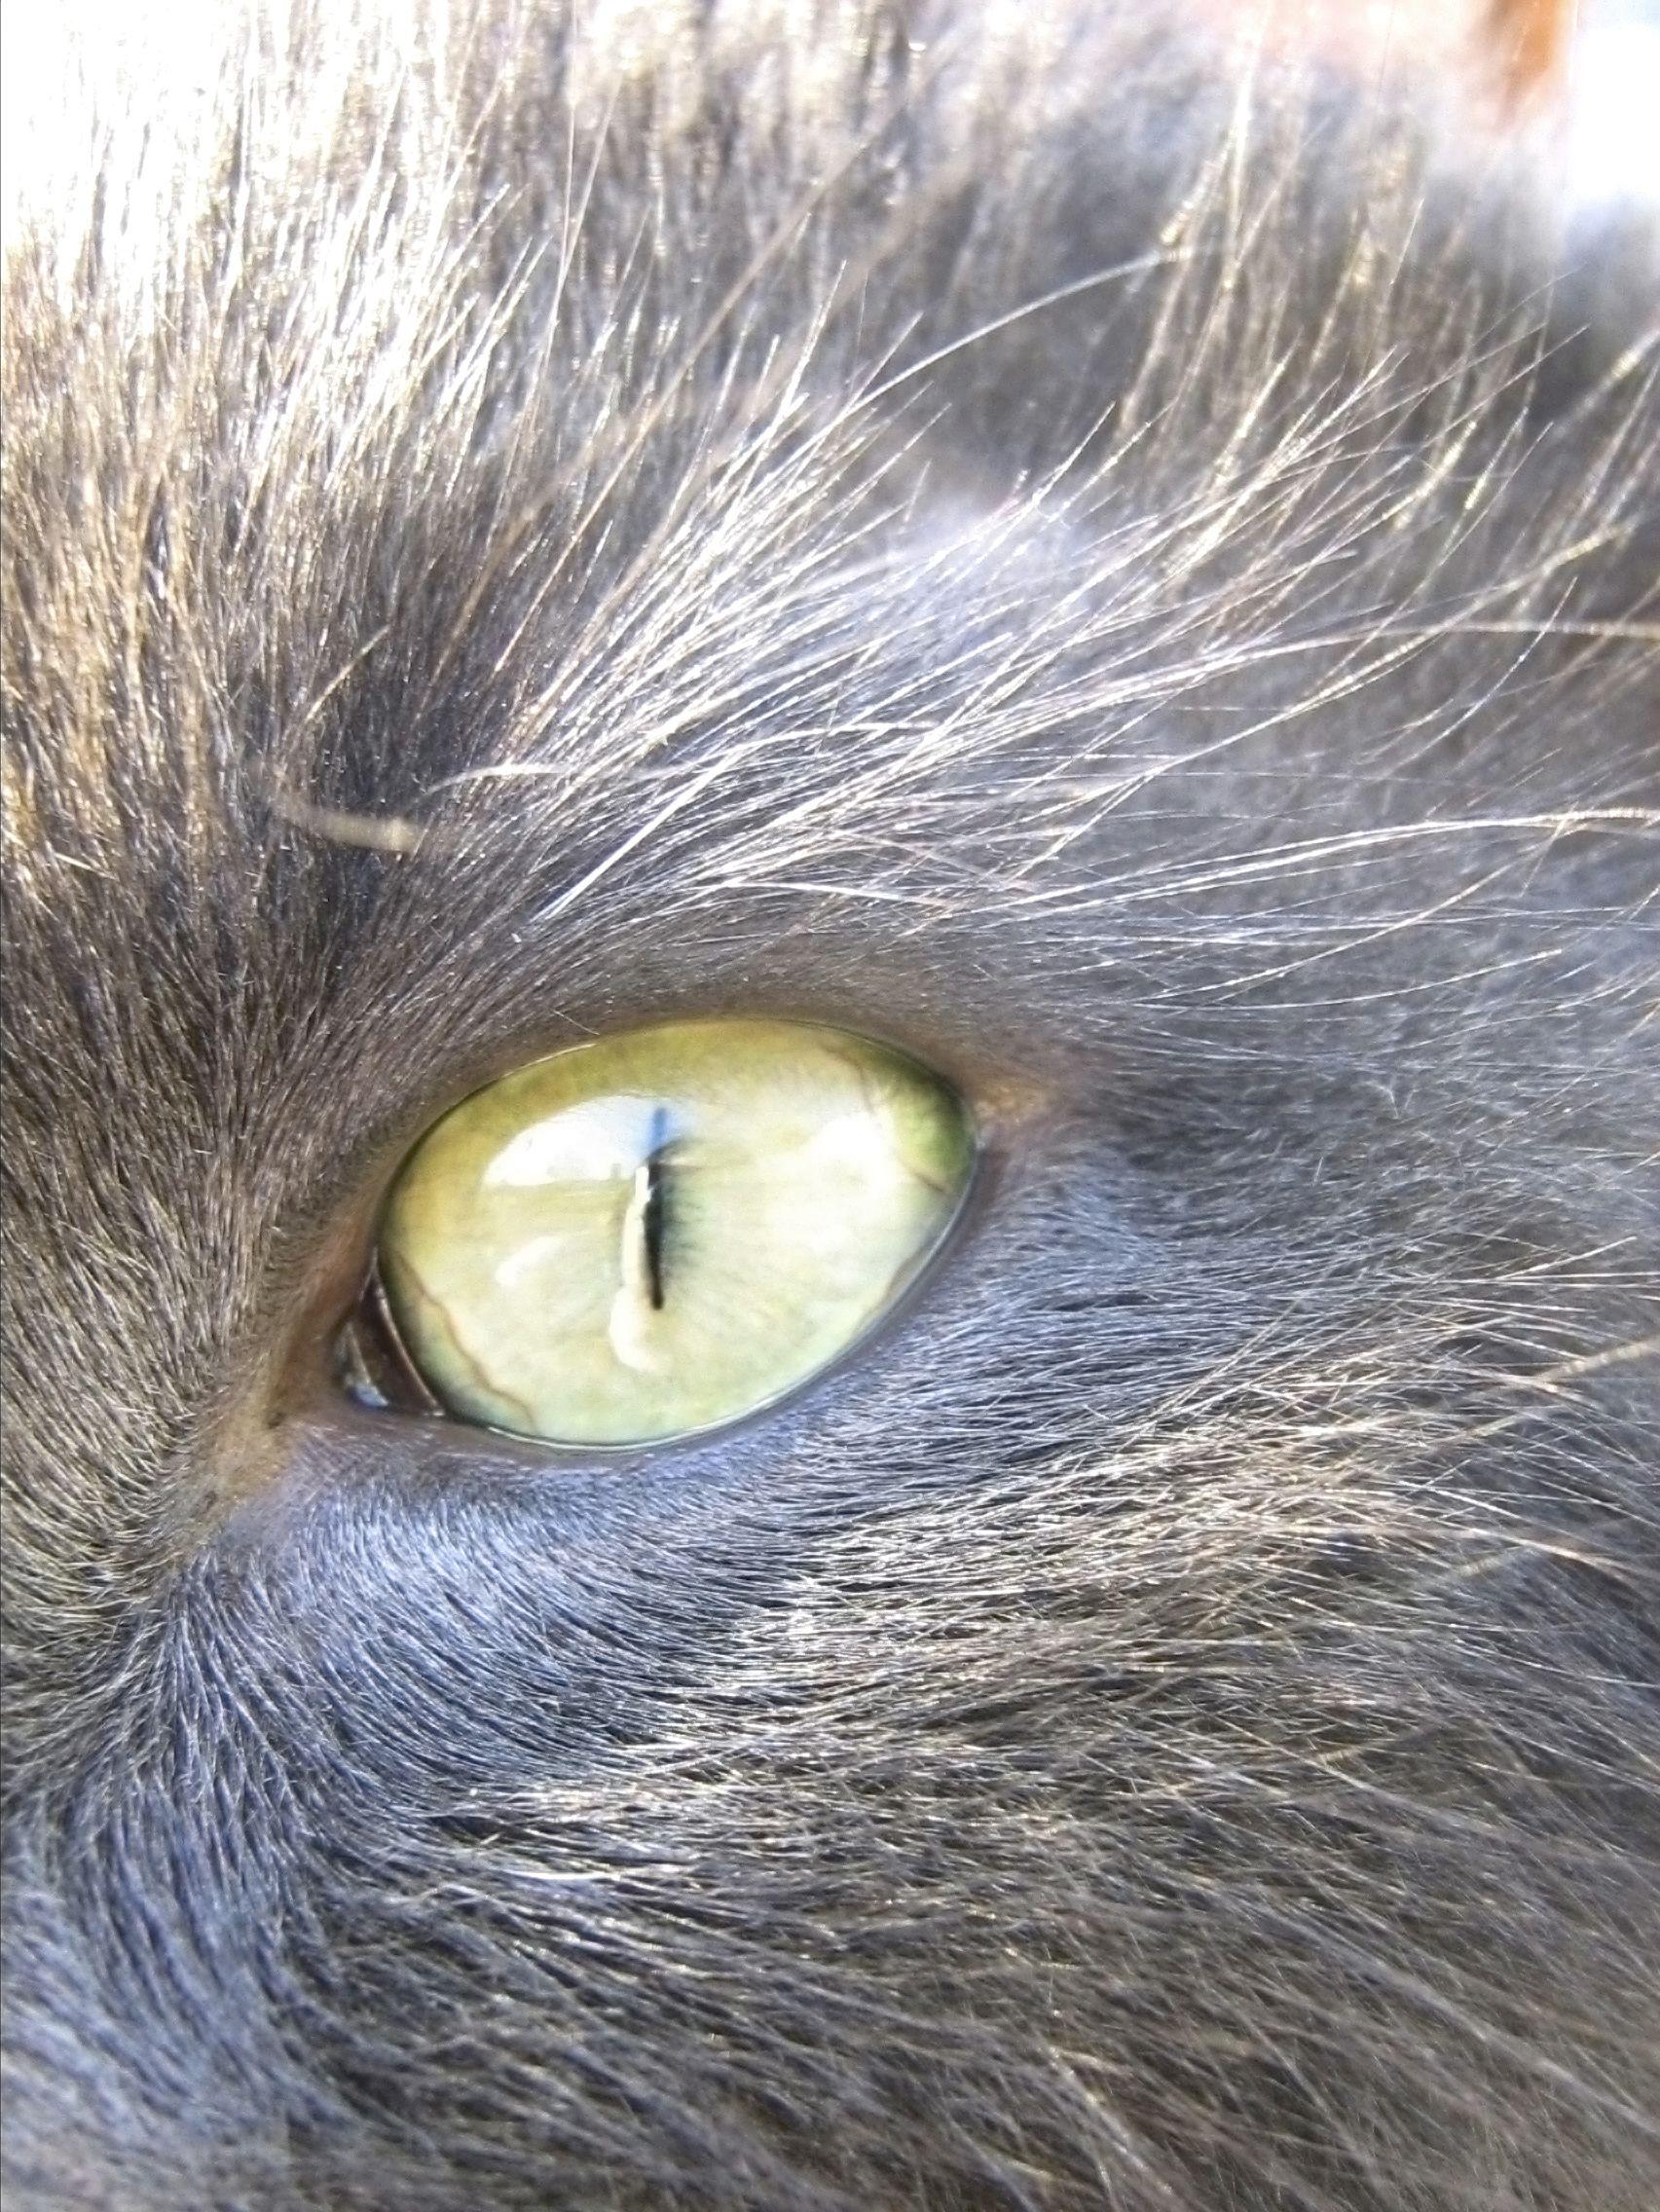 cat eye in bright sunlight | Demonic anatomy | Pinterest | Anatomy ...